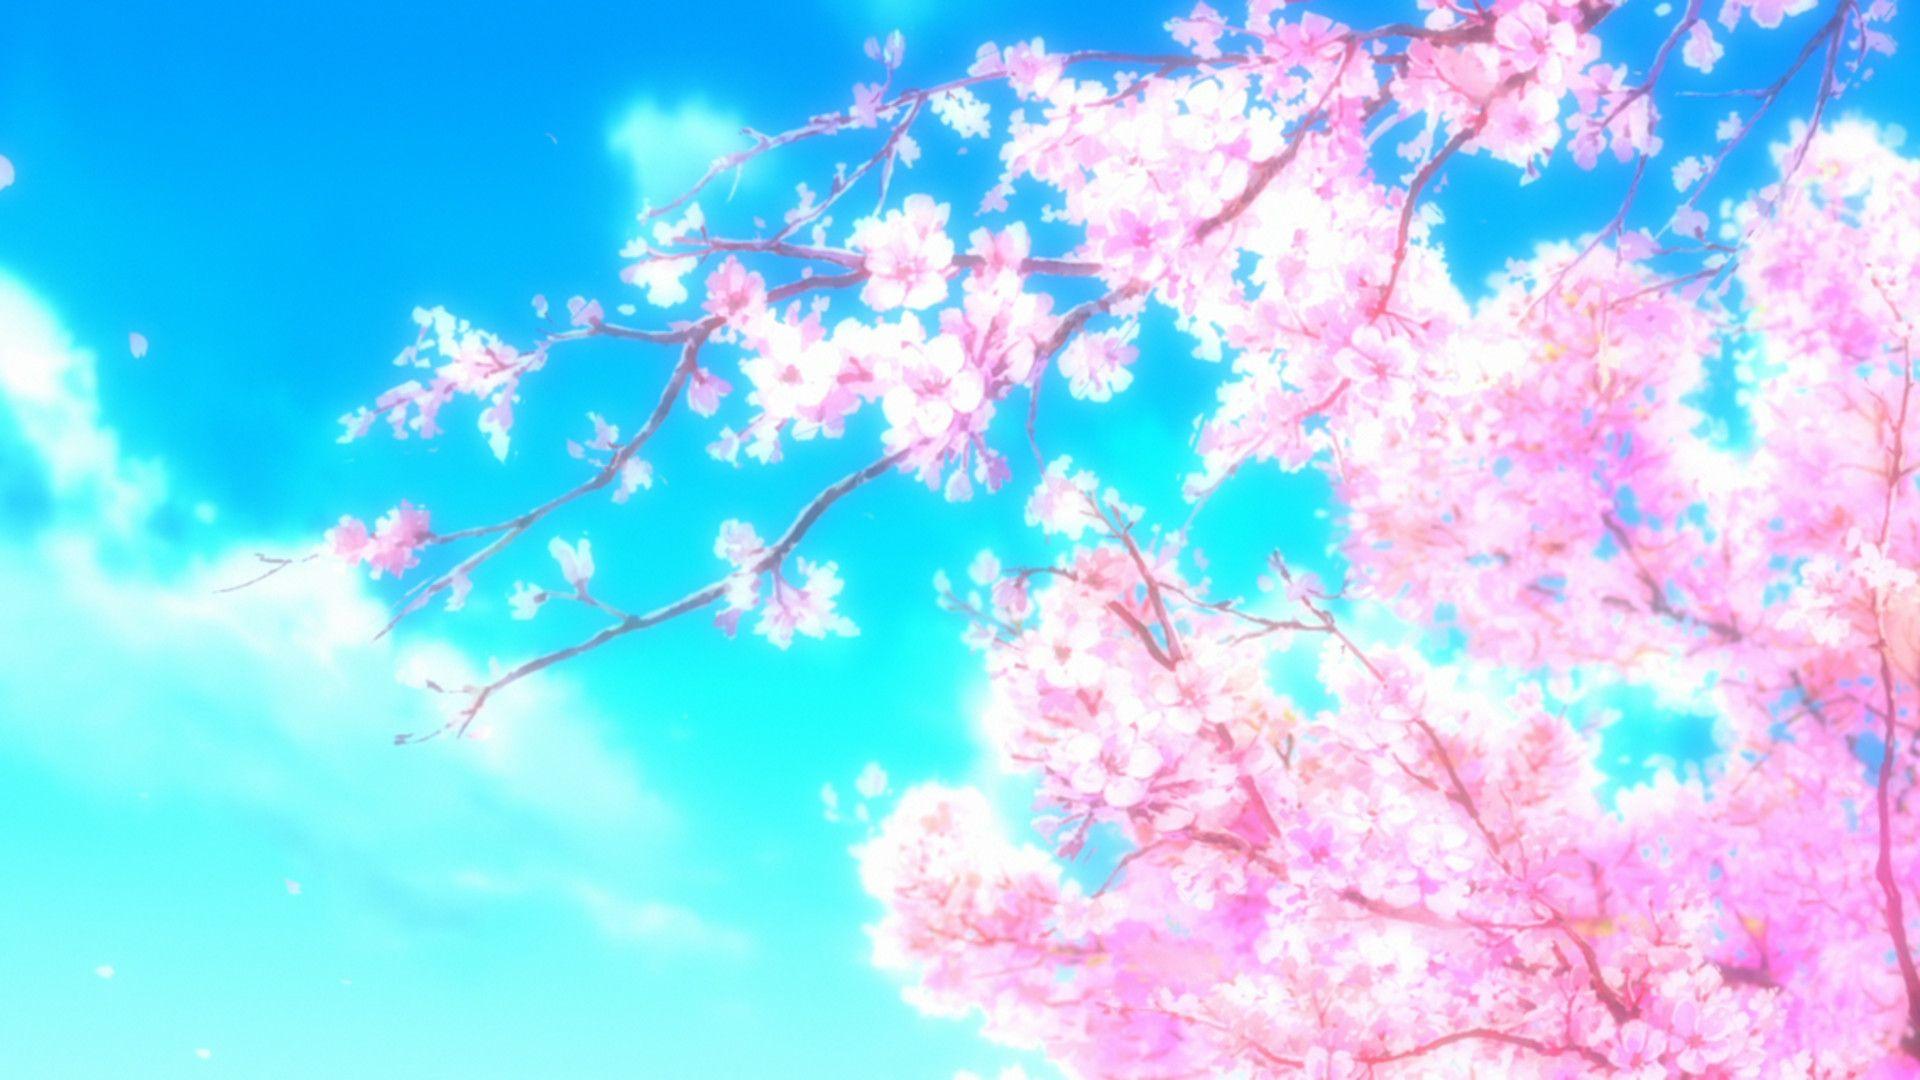 Sakura Tree Wallpaper Anime